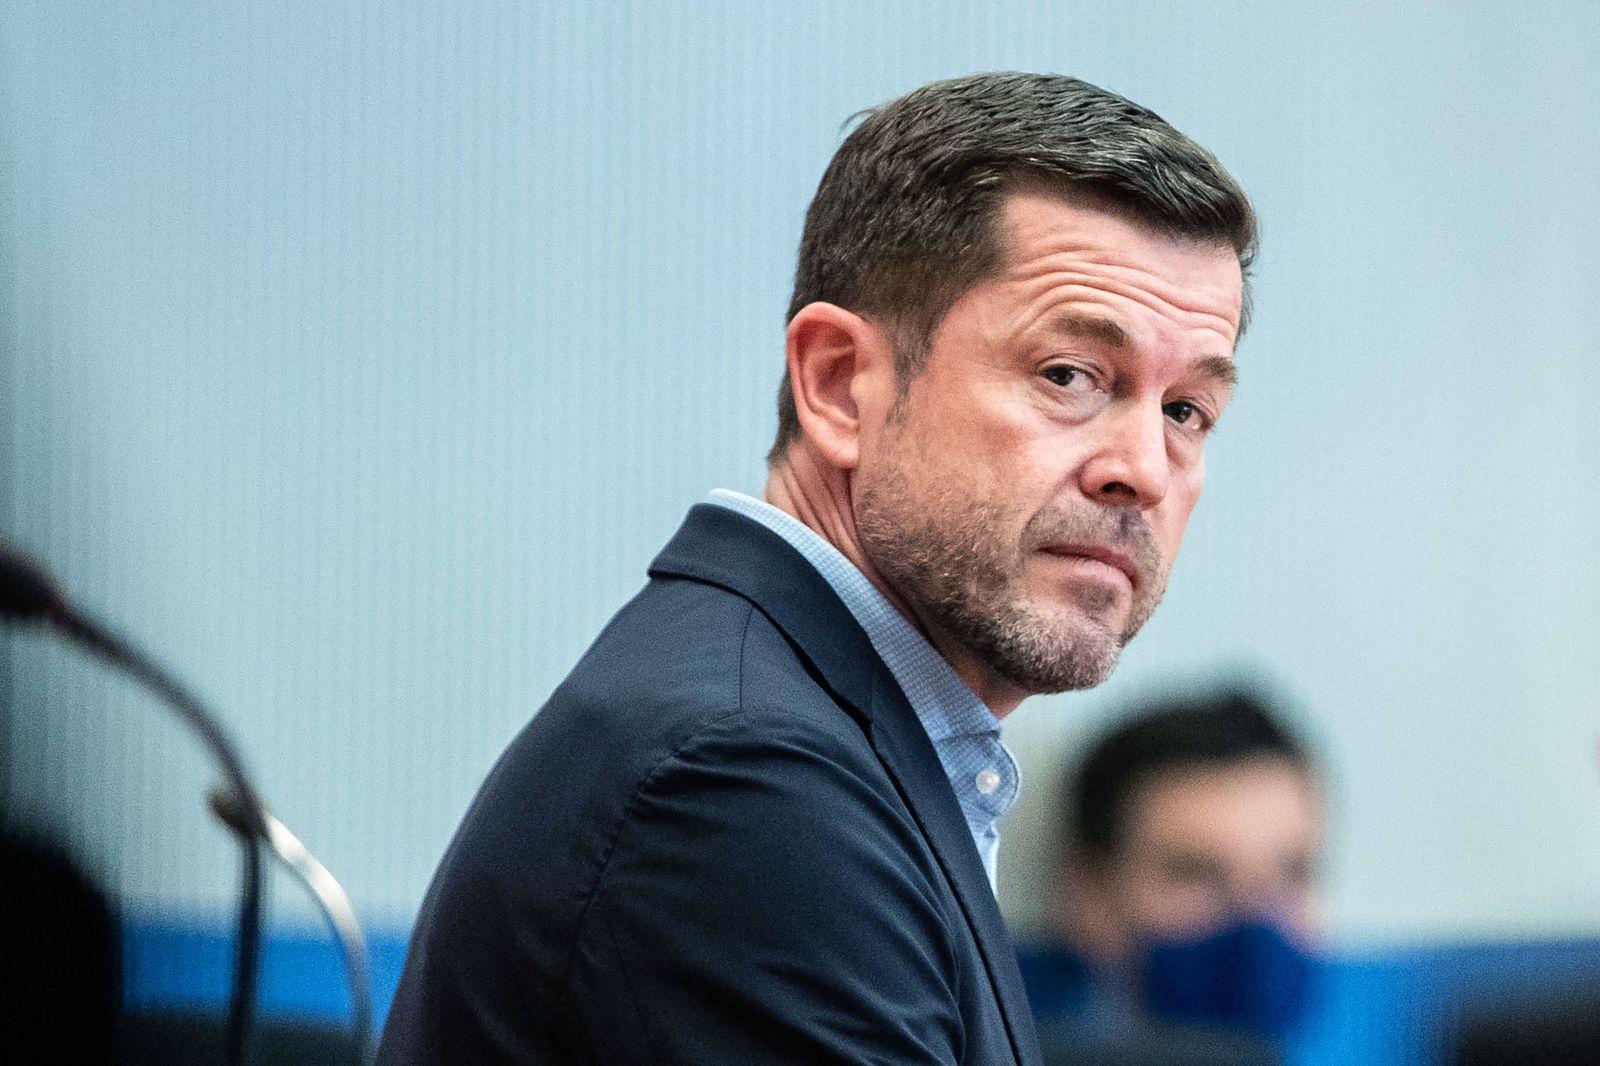 Finance Committee hearing on Wirecard scandal, Berlin, Germany - 17 Dec 2020